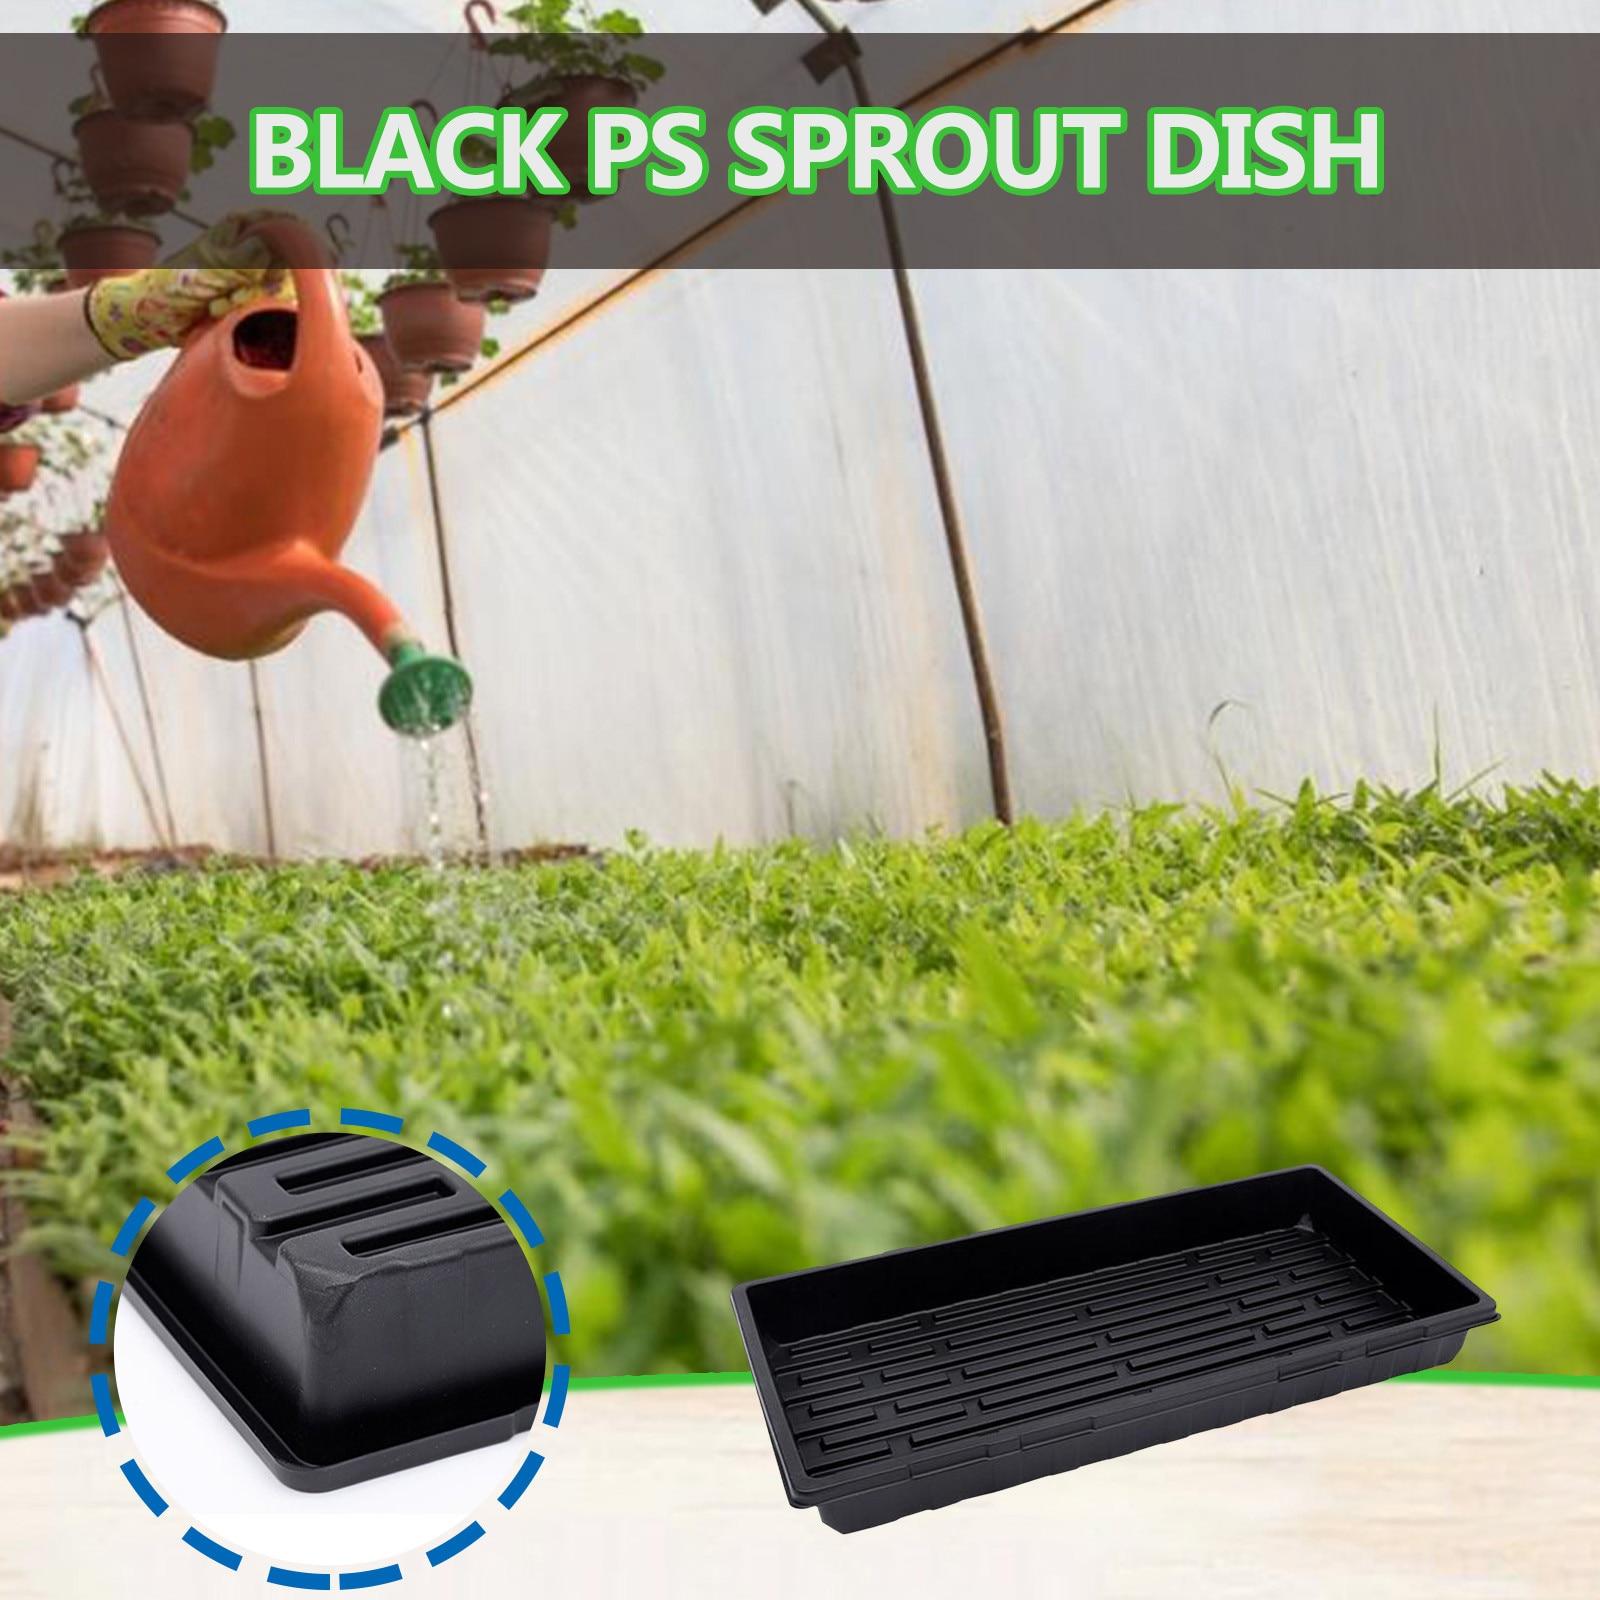 Nursery Pots Rectangular Vegetable Seedling Tray For Leaf Inserting And Soaking Pot Balcony Bonsai Bowl Basin Planter Imitation